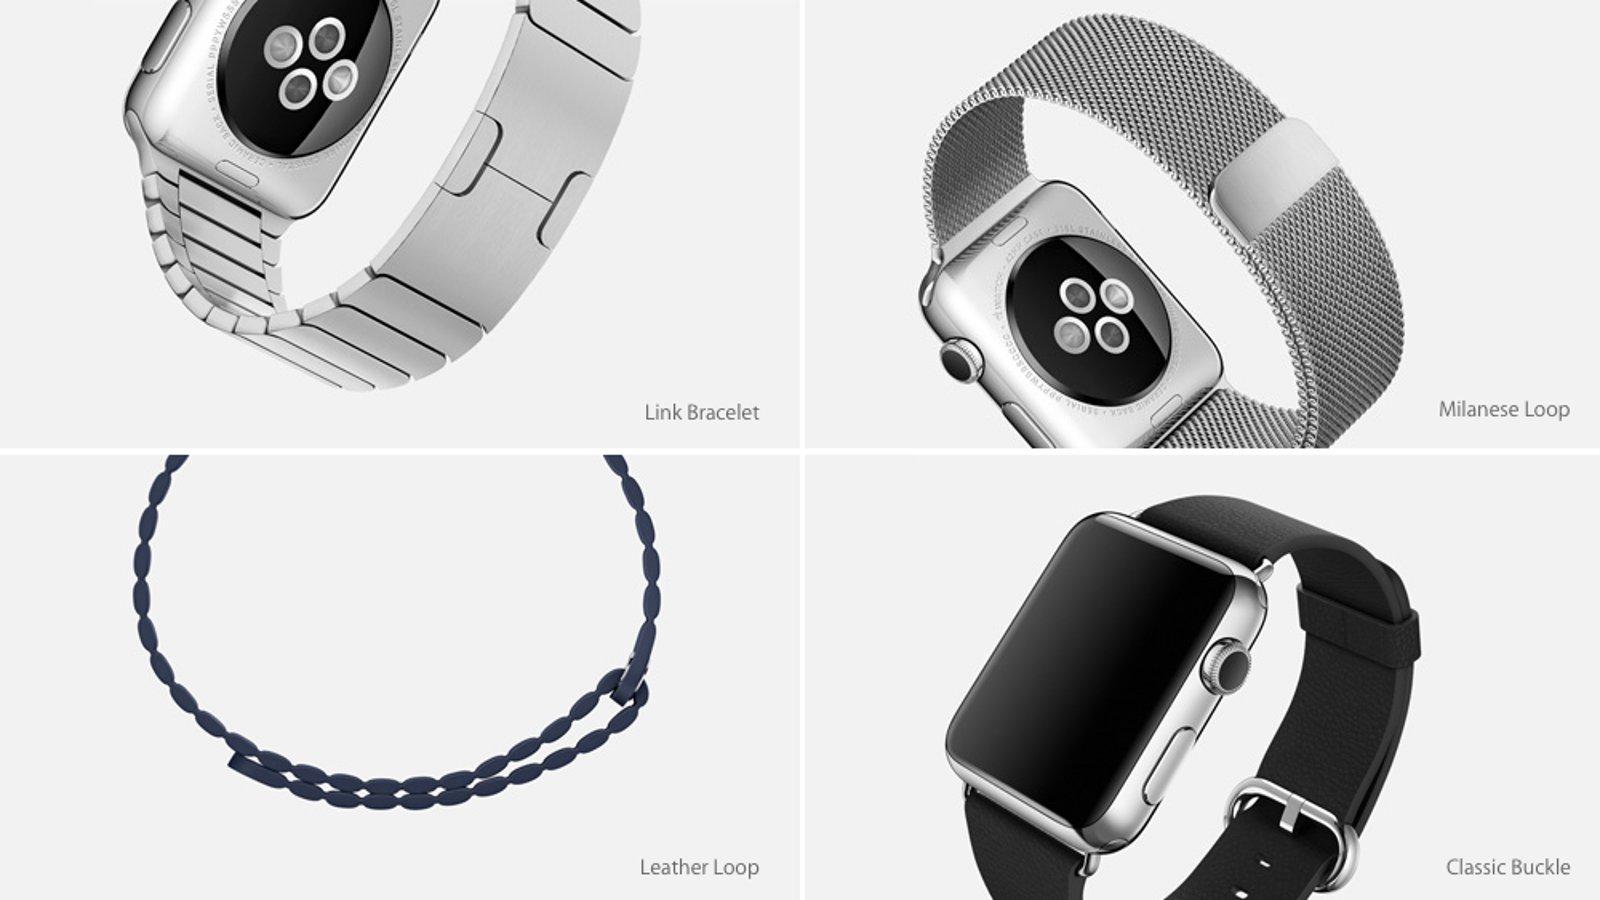 Apple Watch - Bands